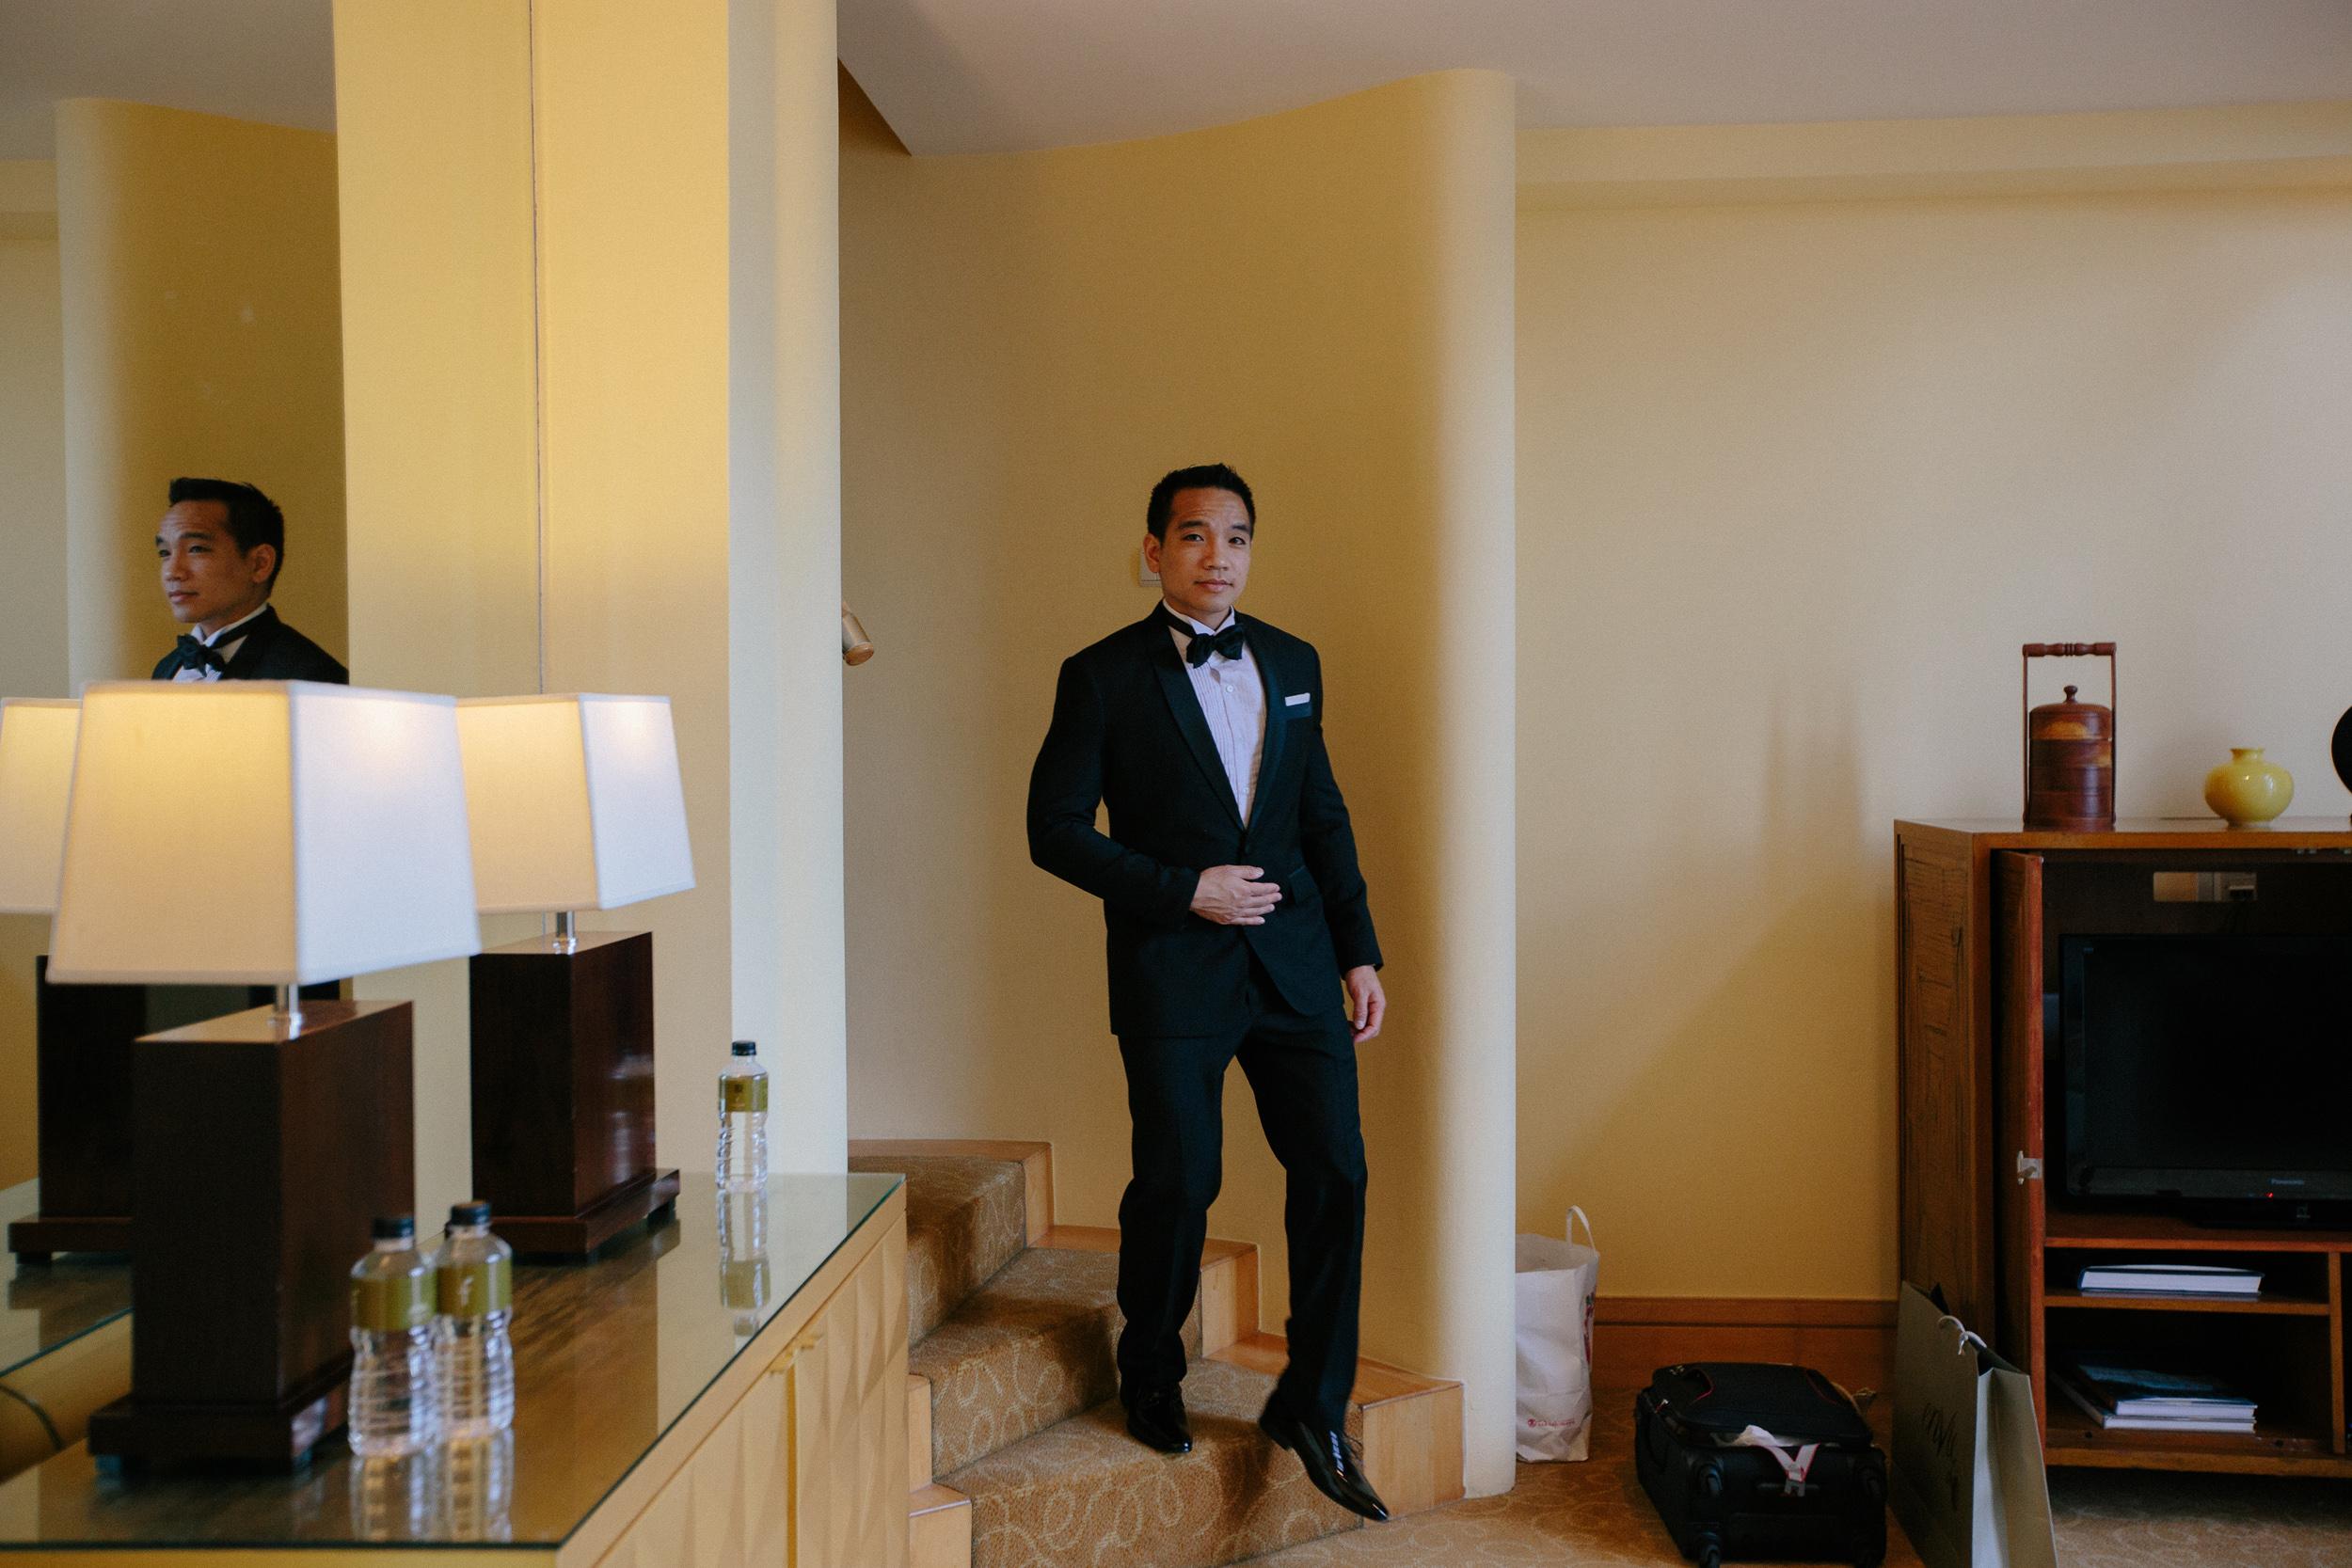 singapore-wedding-photographer-cheryl-matthew-fullerton-hotel-wedding-36.jpg